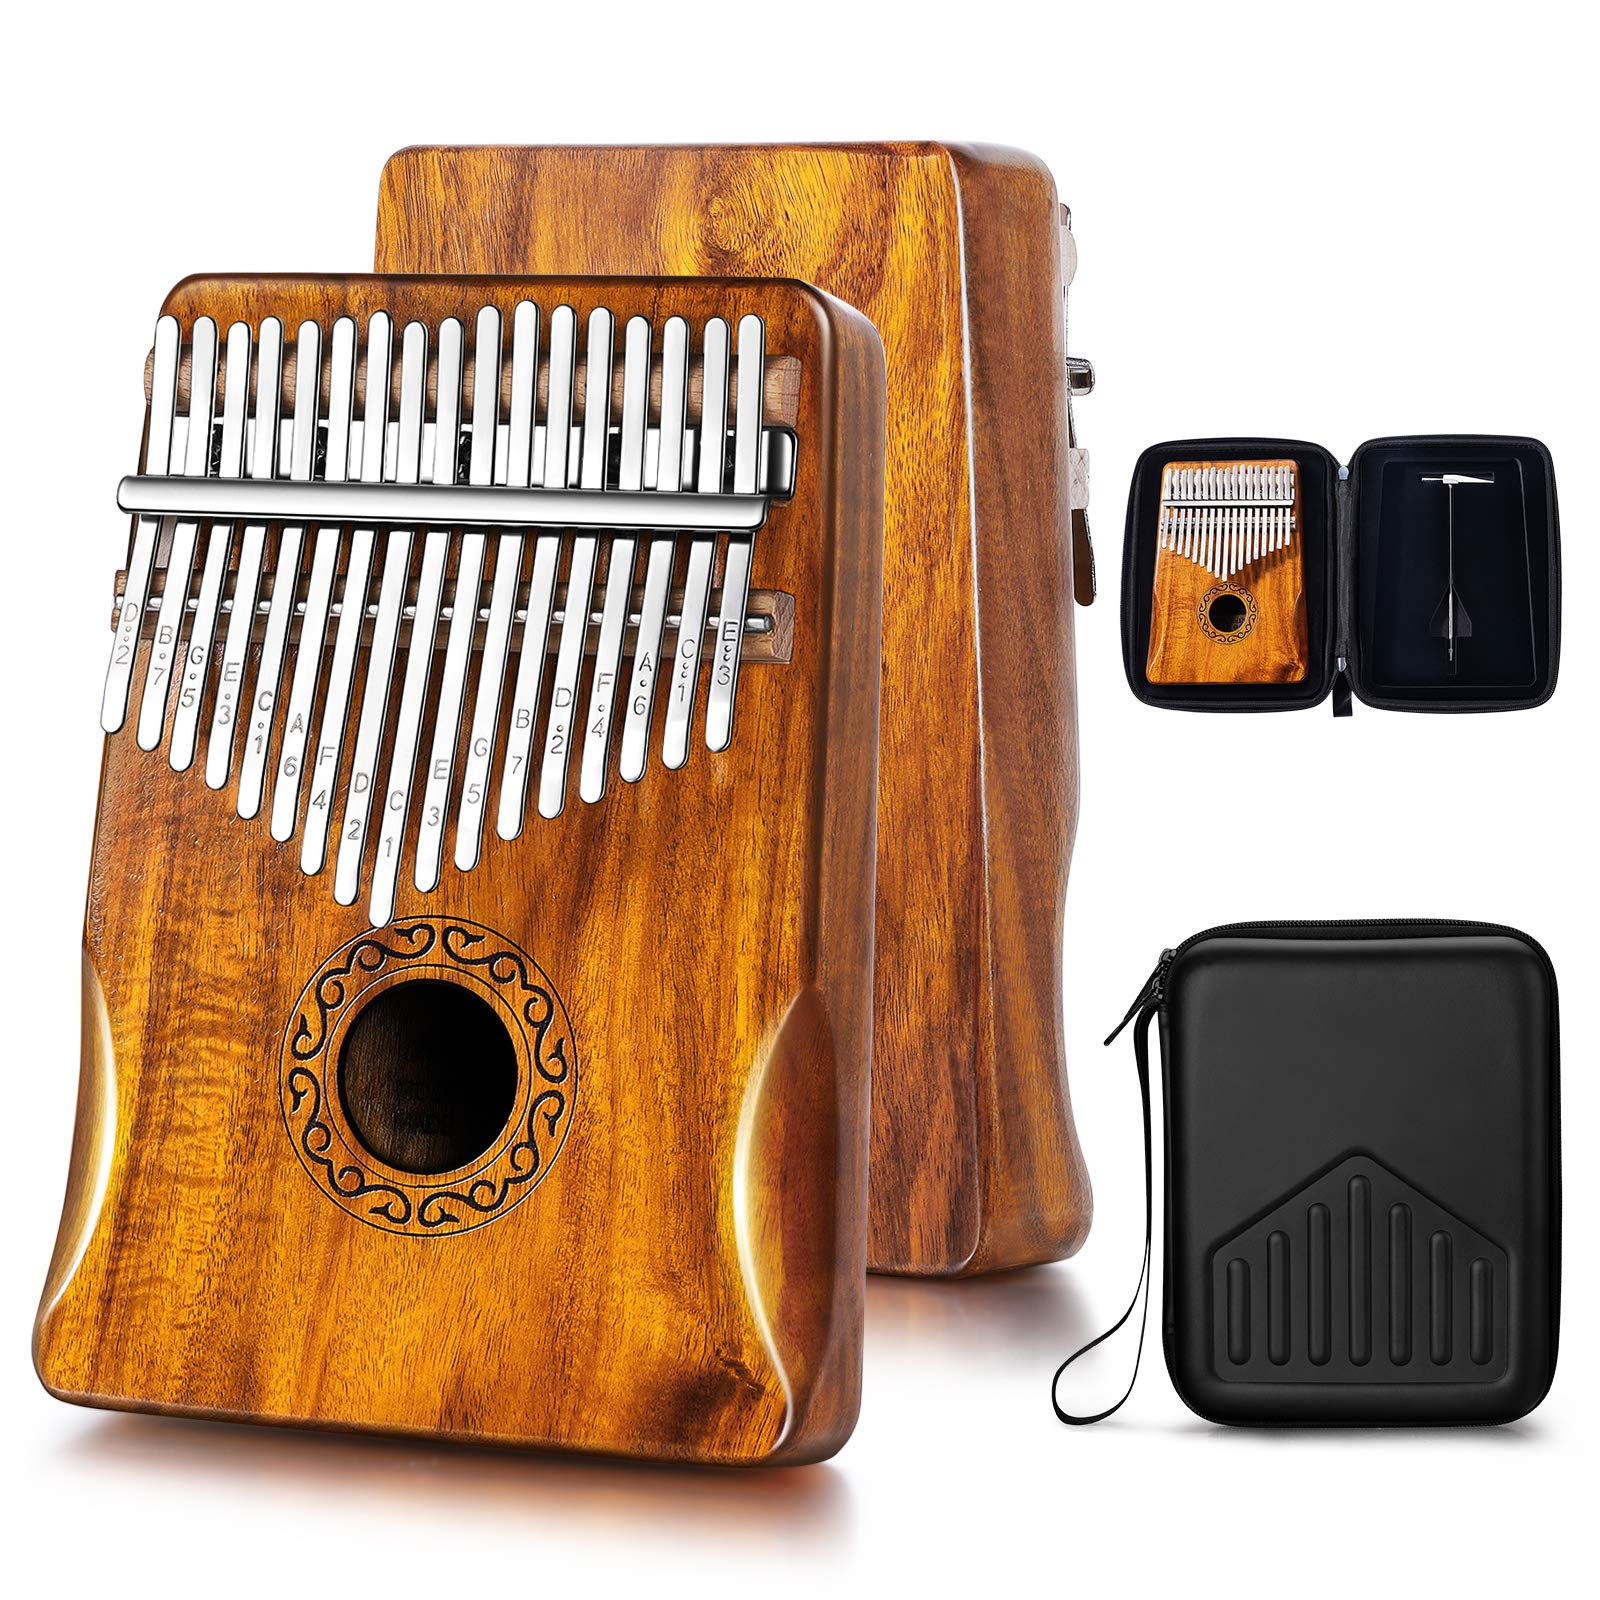 MIFOGE Kalimba Thumb Piano 17 Keys with Koa Acacia Wood,Mbira,Finger Piano Builts-in Waterproof Protective Box, Easy to Learn Portable Musical Instrument,Gift for Kids Adult Beginners (Koa)